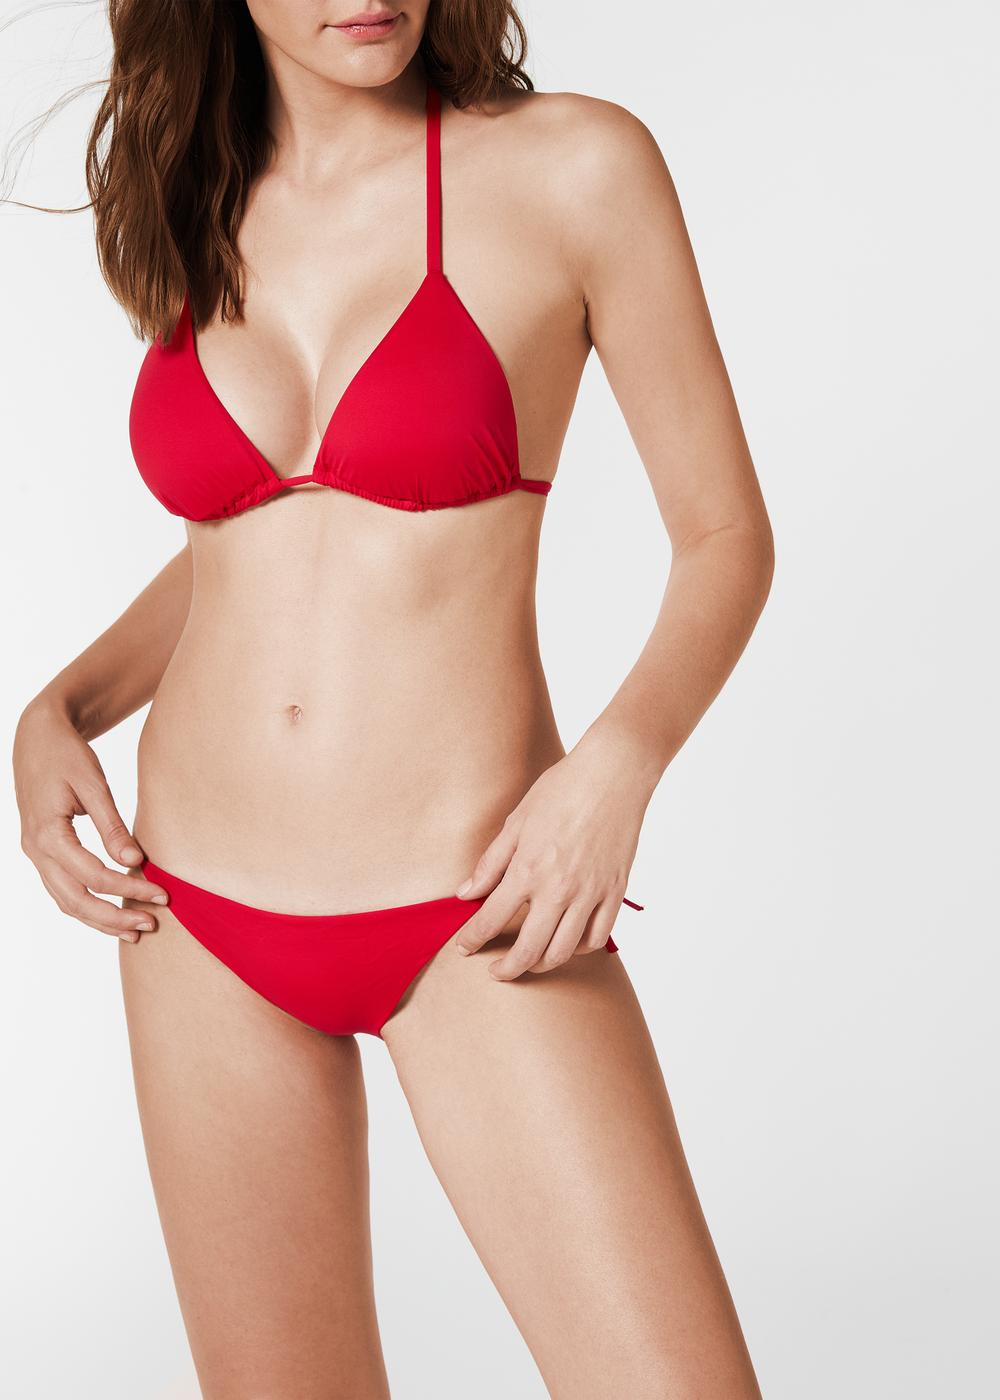 Seitlich gebundene Bikinihose Indonesia